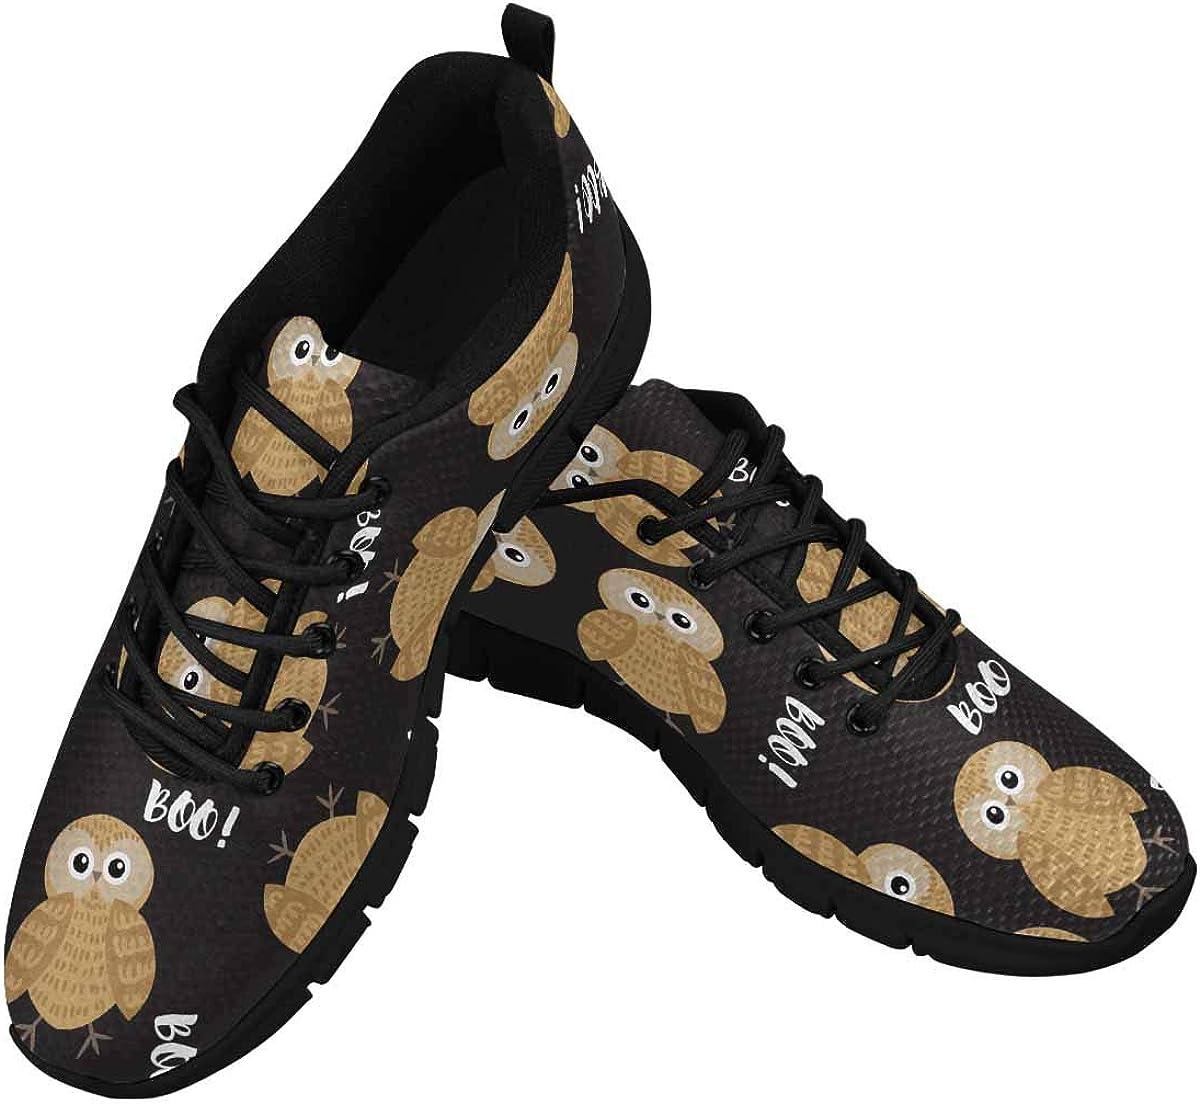 INTERESTPRINT Halloween Owl Boo Women's Breathable Comfort Mesh Fashion Sneakers